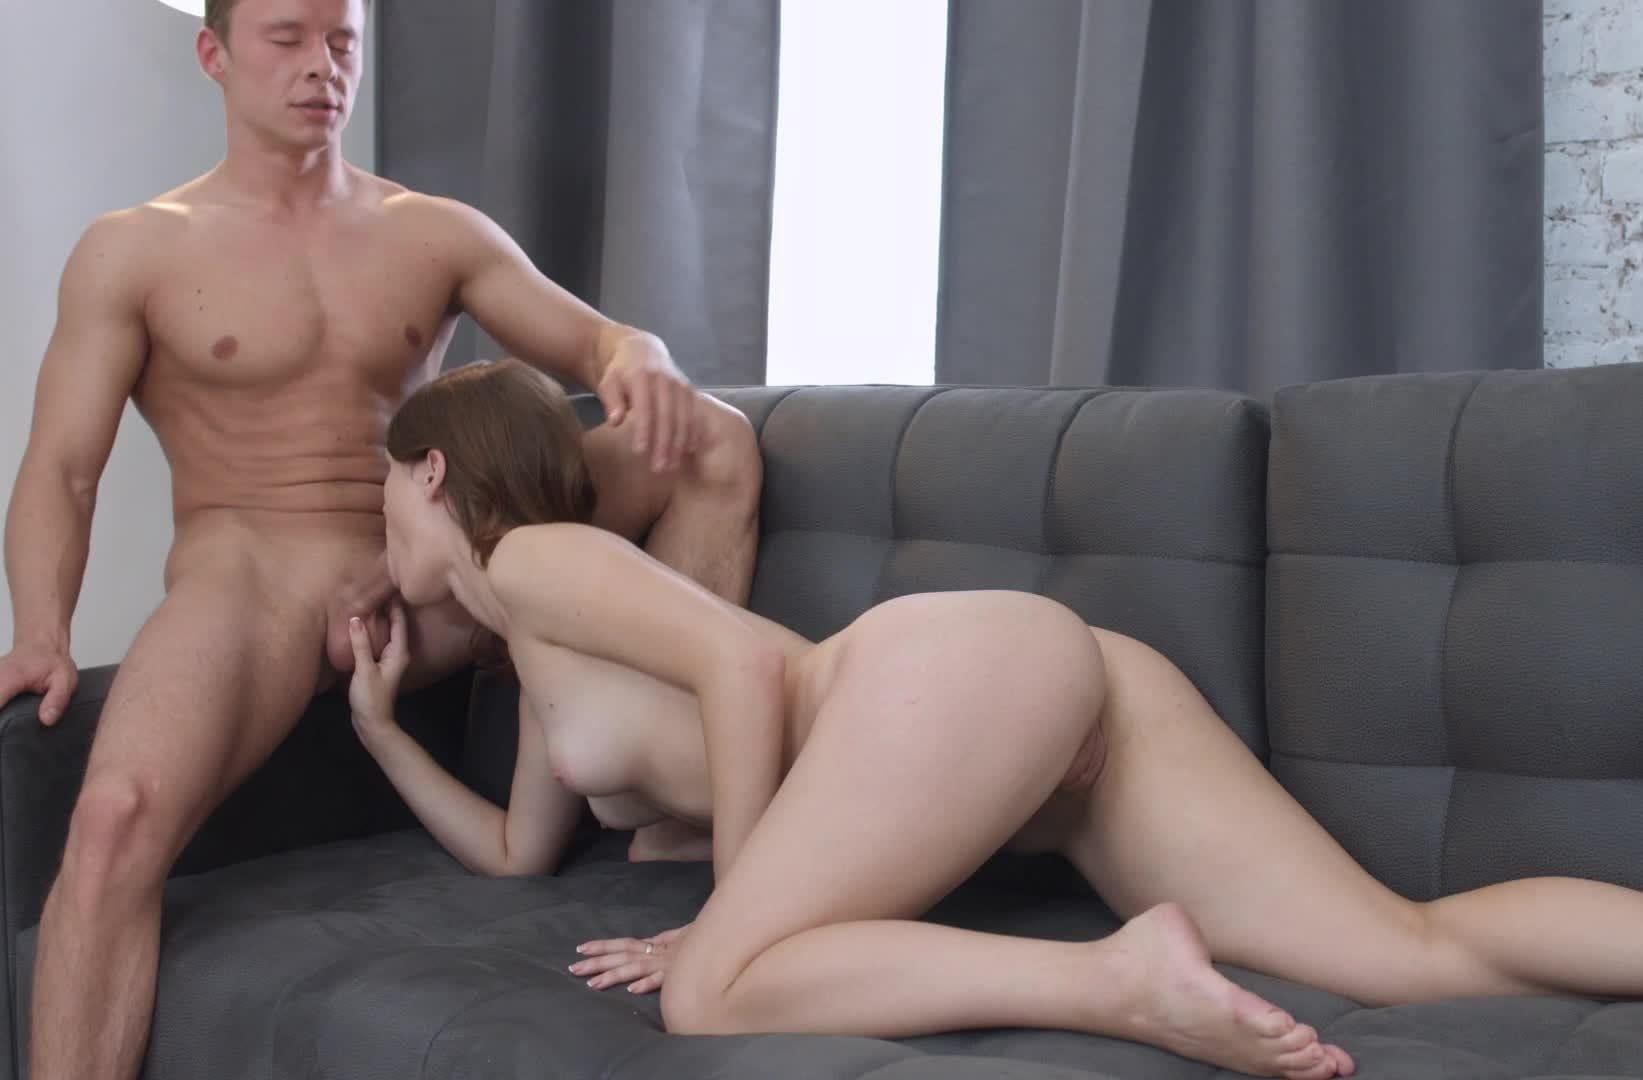 Секс с ирой на съемной квартире видео, ну и жопа у латинки